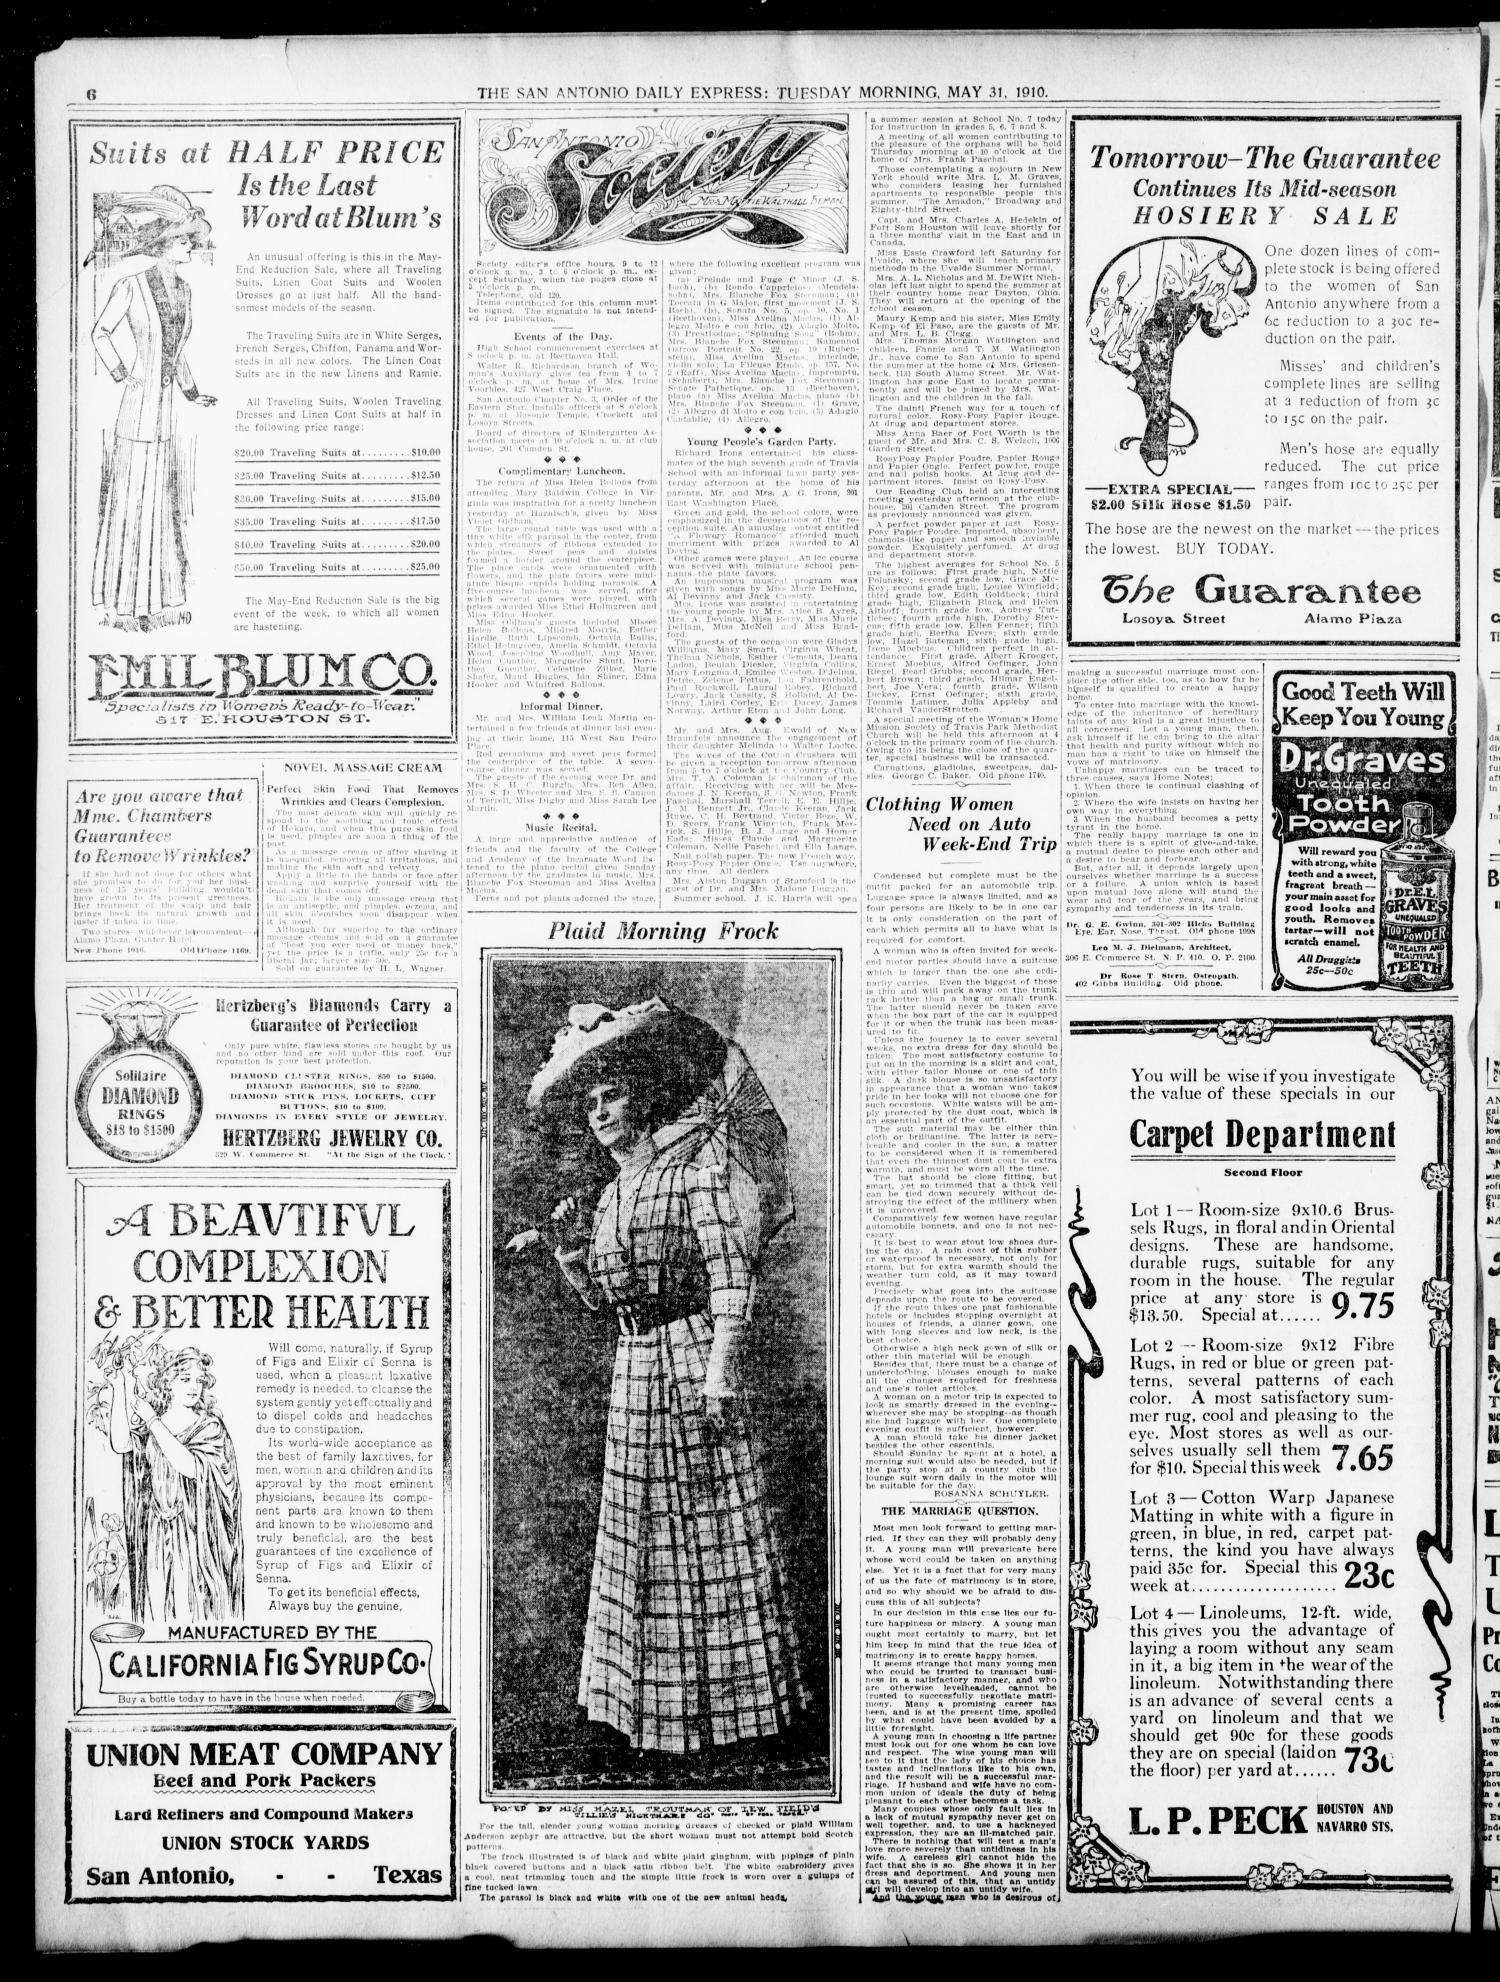 The Daily Express. (San Antonio, Tex.), Vol. 45, No. 151, Ed. 1 Tuesday, May 31, 1910 - Page 6 of 16 - The Portal to Texas History